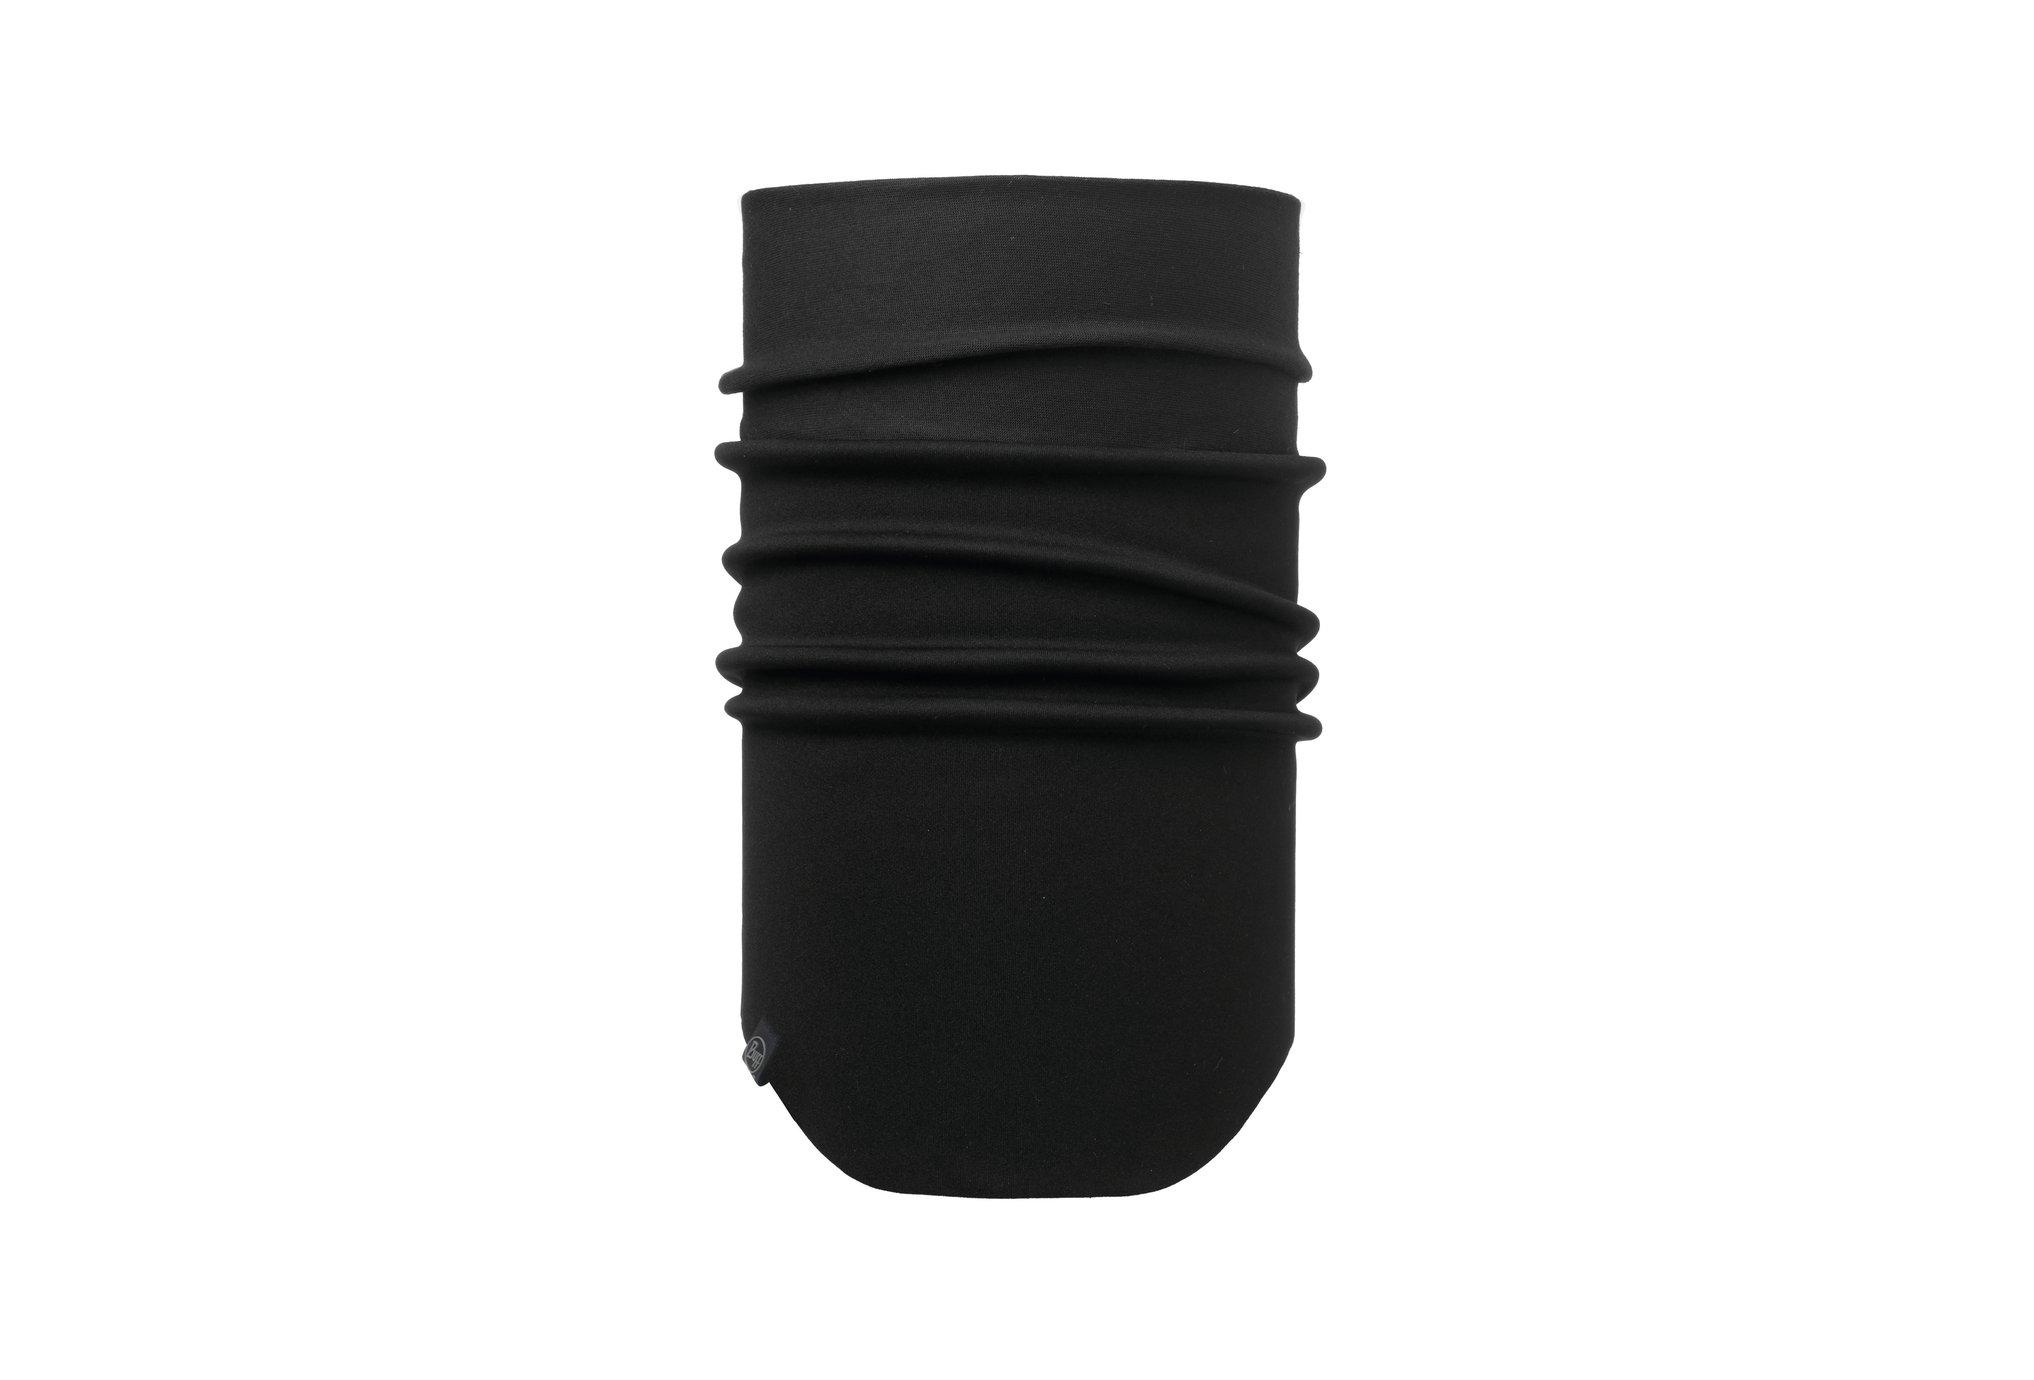 Buff Windproof Neckwarmer Solid Black Tours de cou